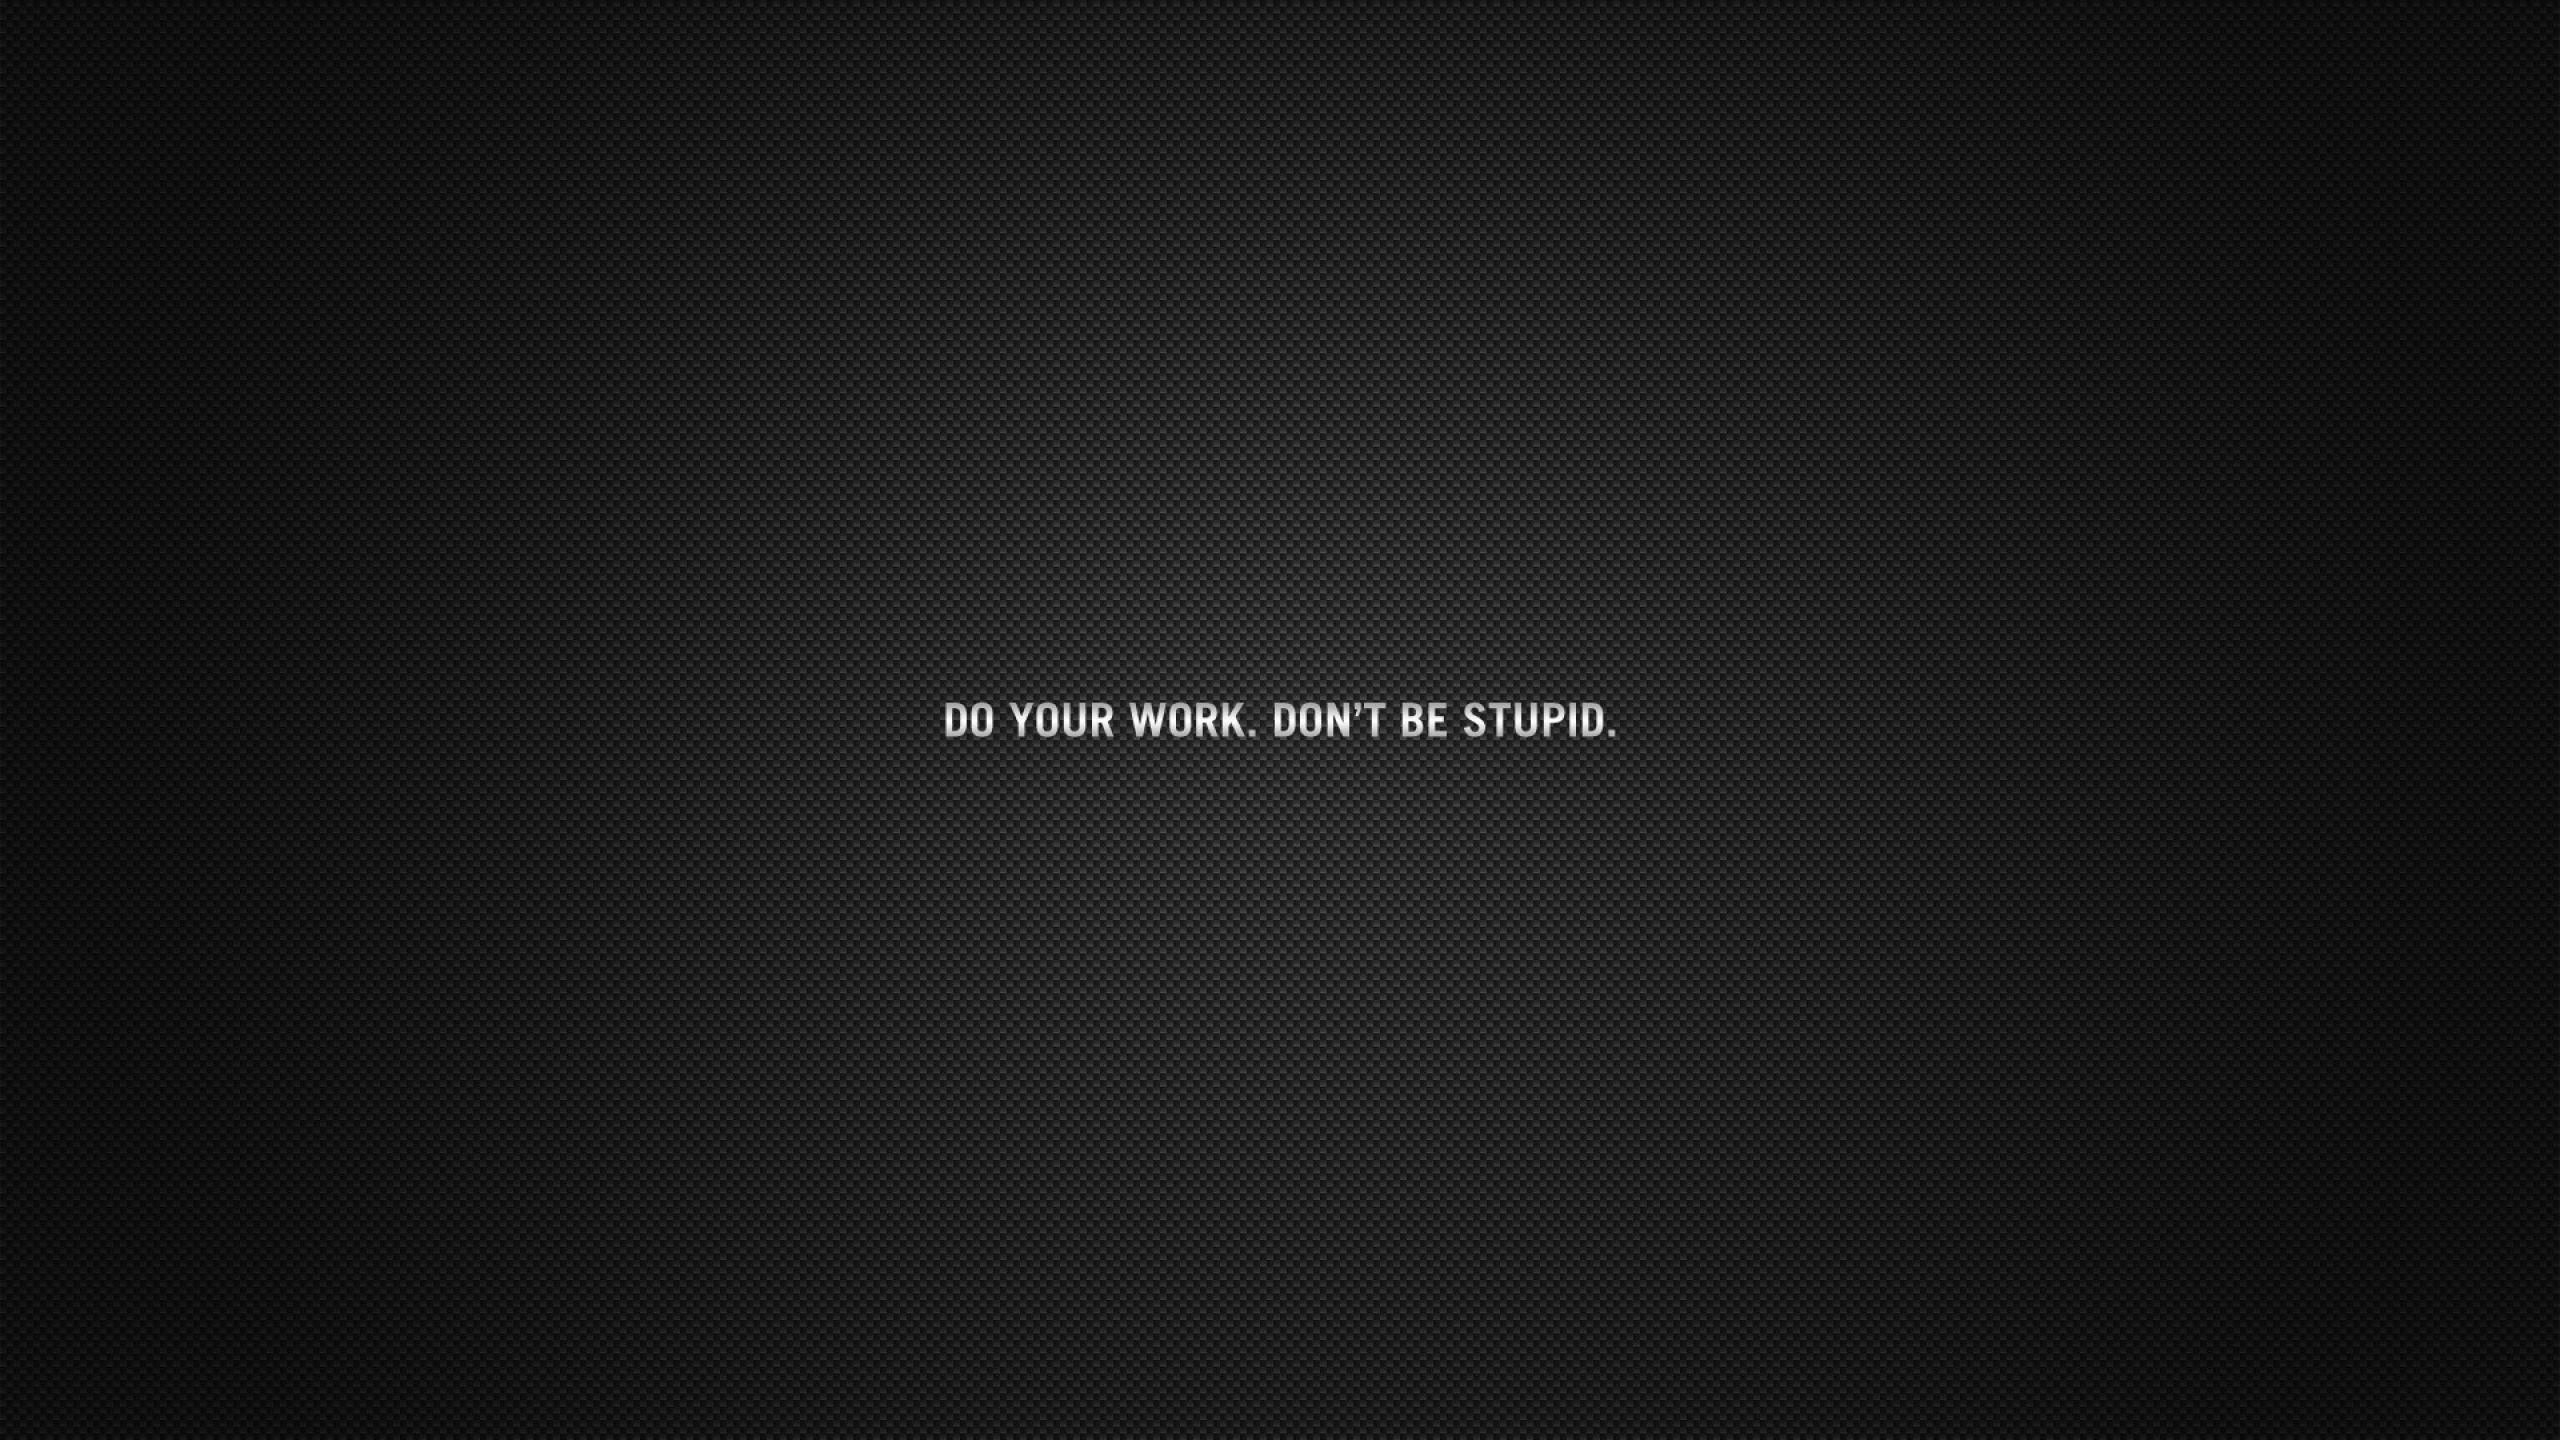 Wallpaper inscription, cardboard, black, do your work, advice